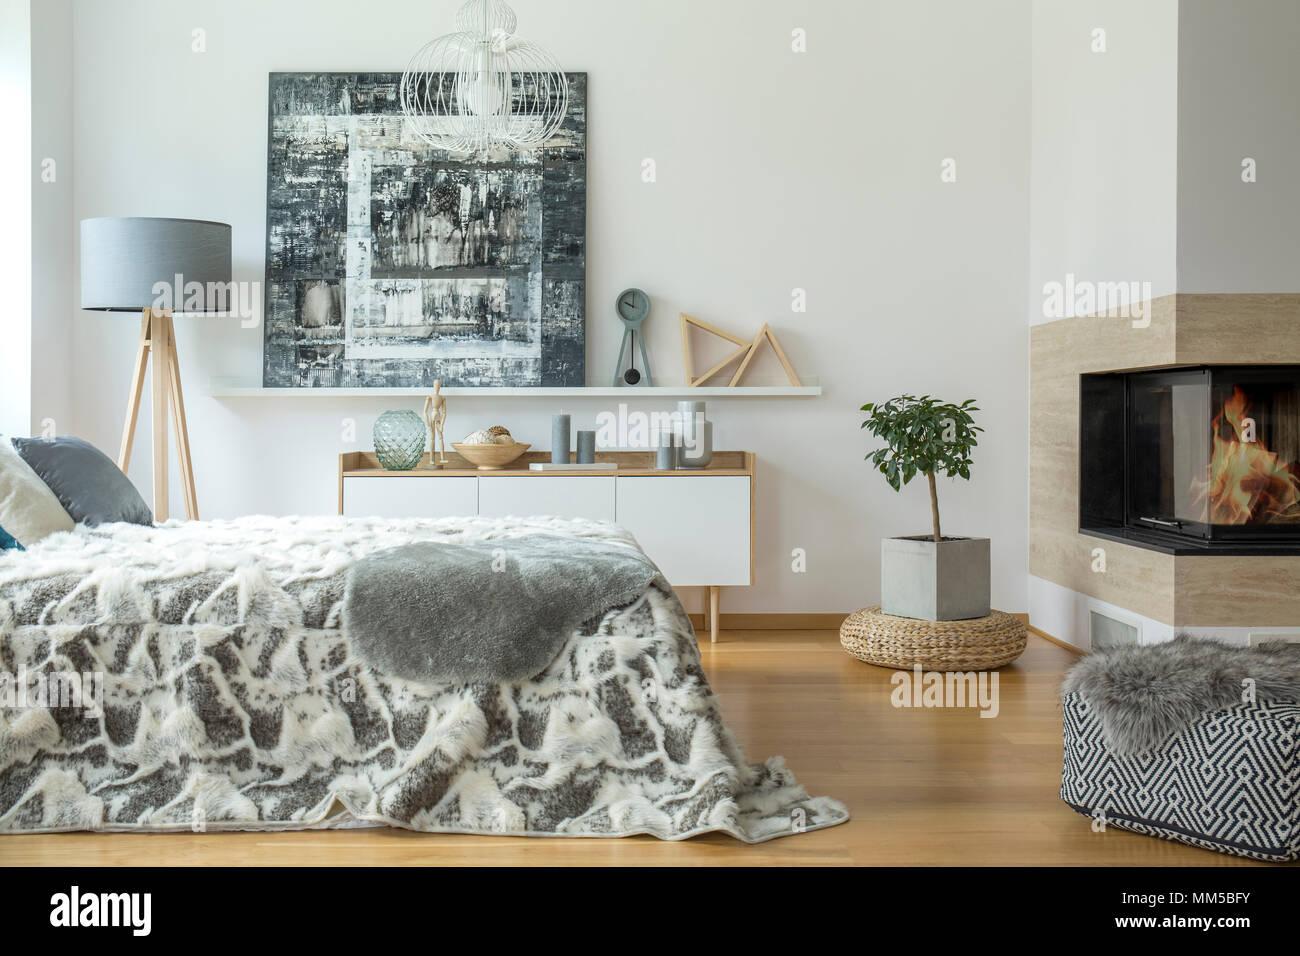 Pitture Per Interni Grigio : Pittura camera da letto grigio perla pittura camera da letto